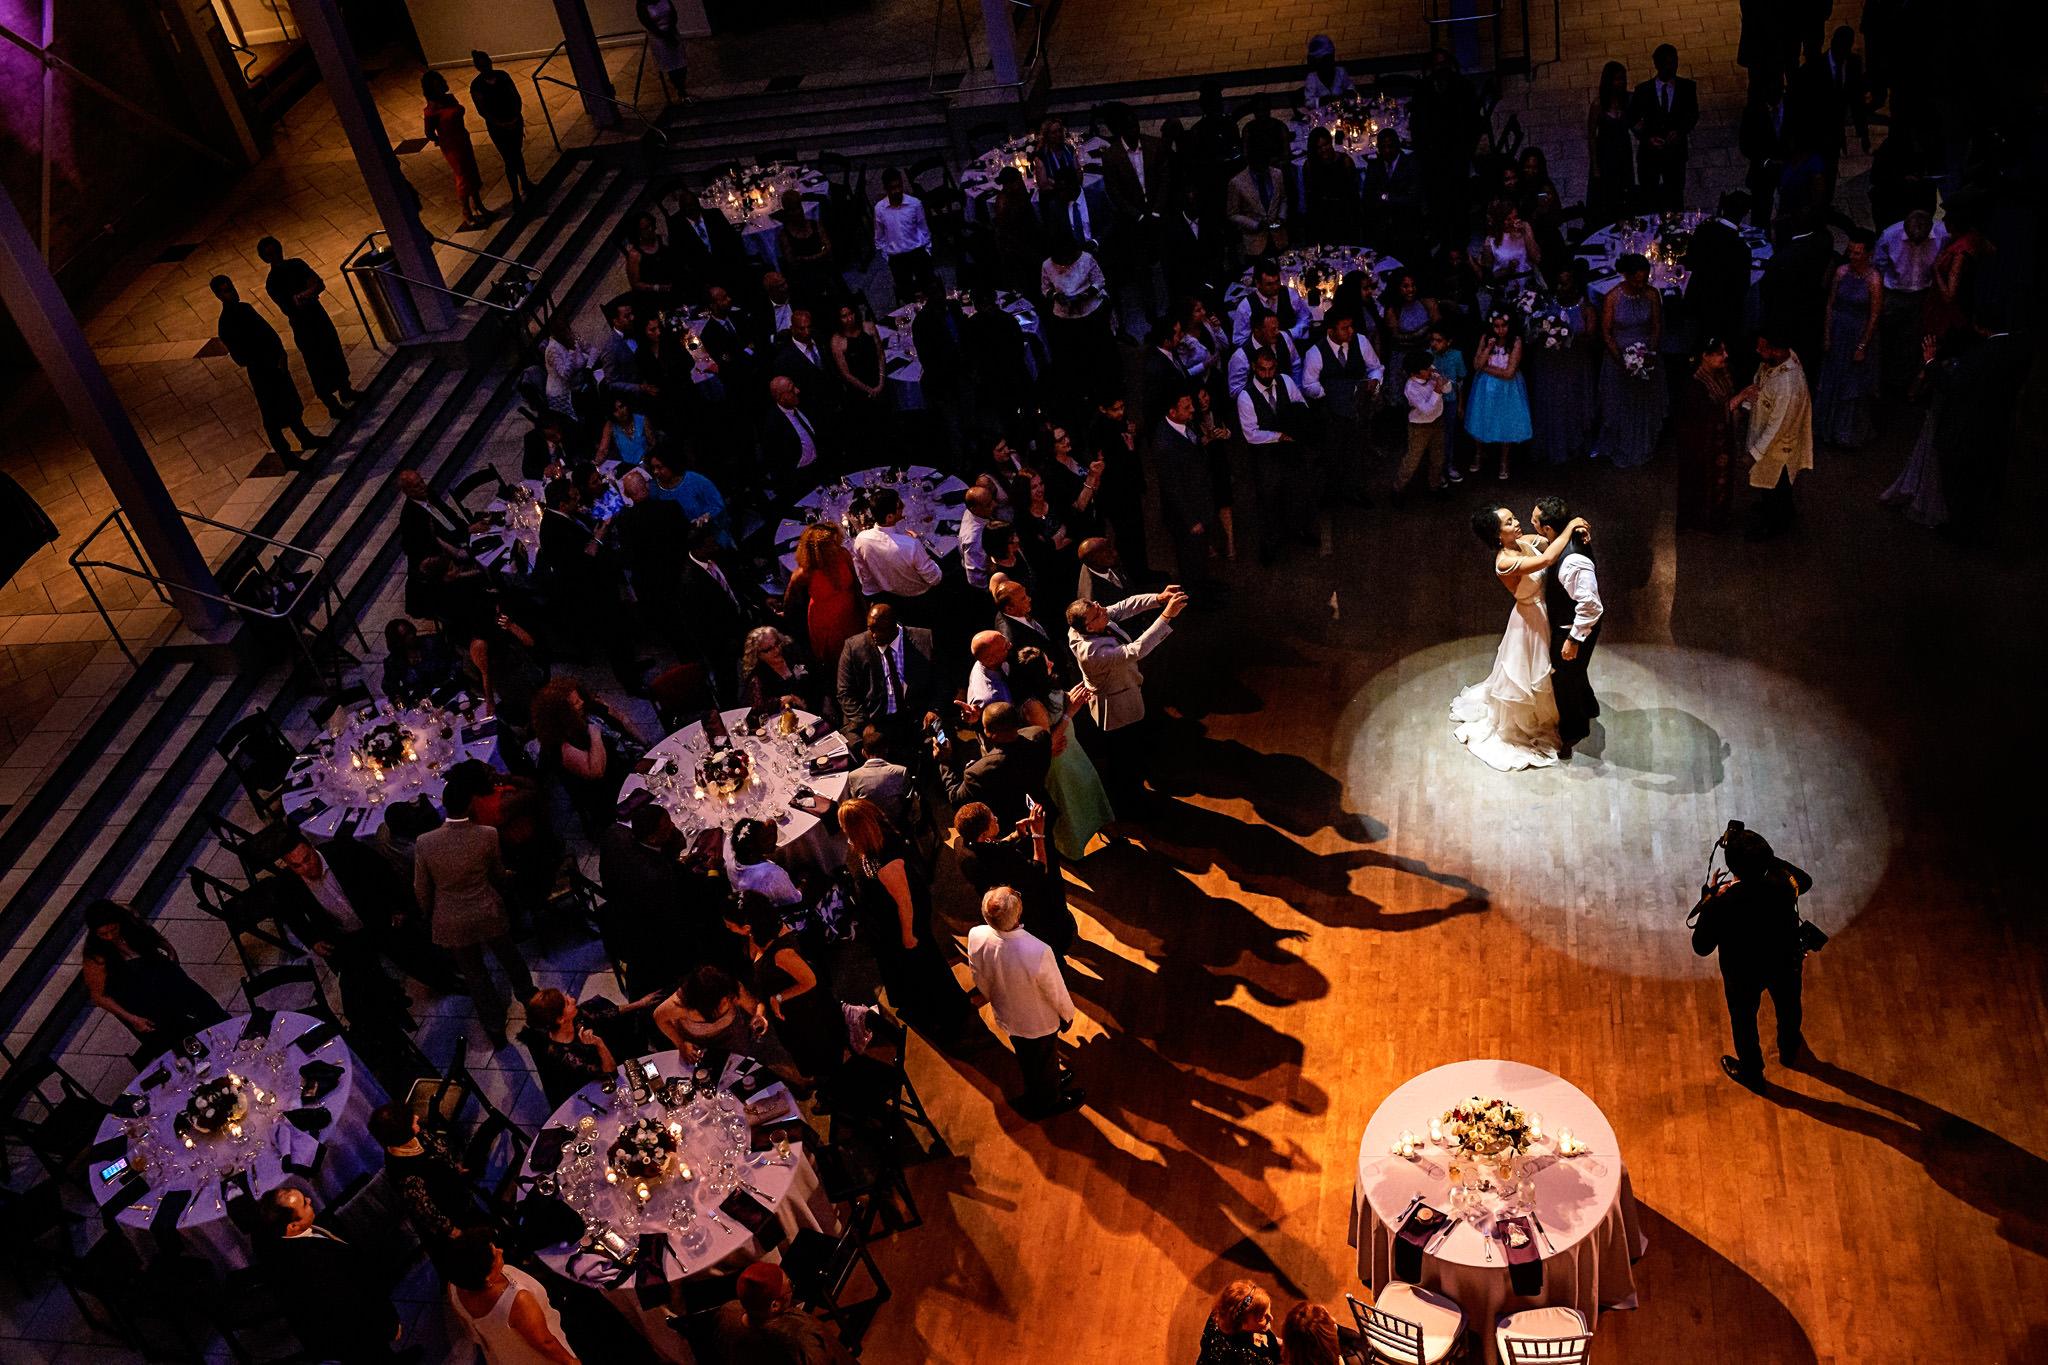 Bride and bridegroom open the dancefloor at their wedding reception in San Francisco, California